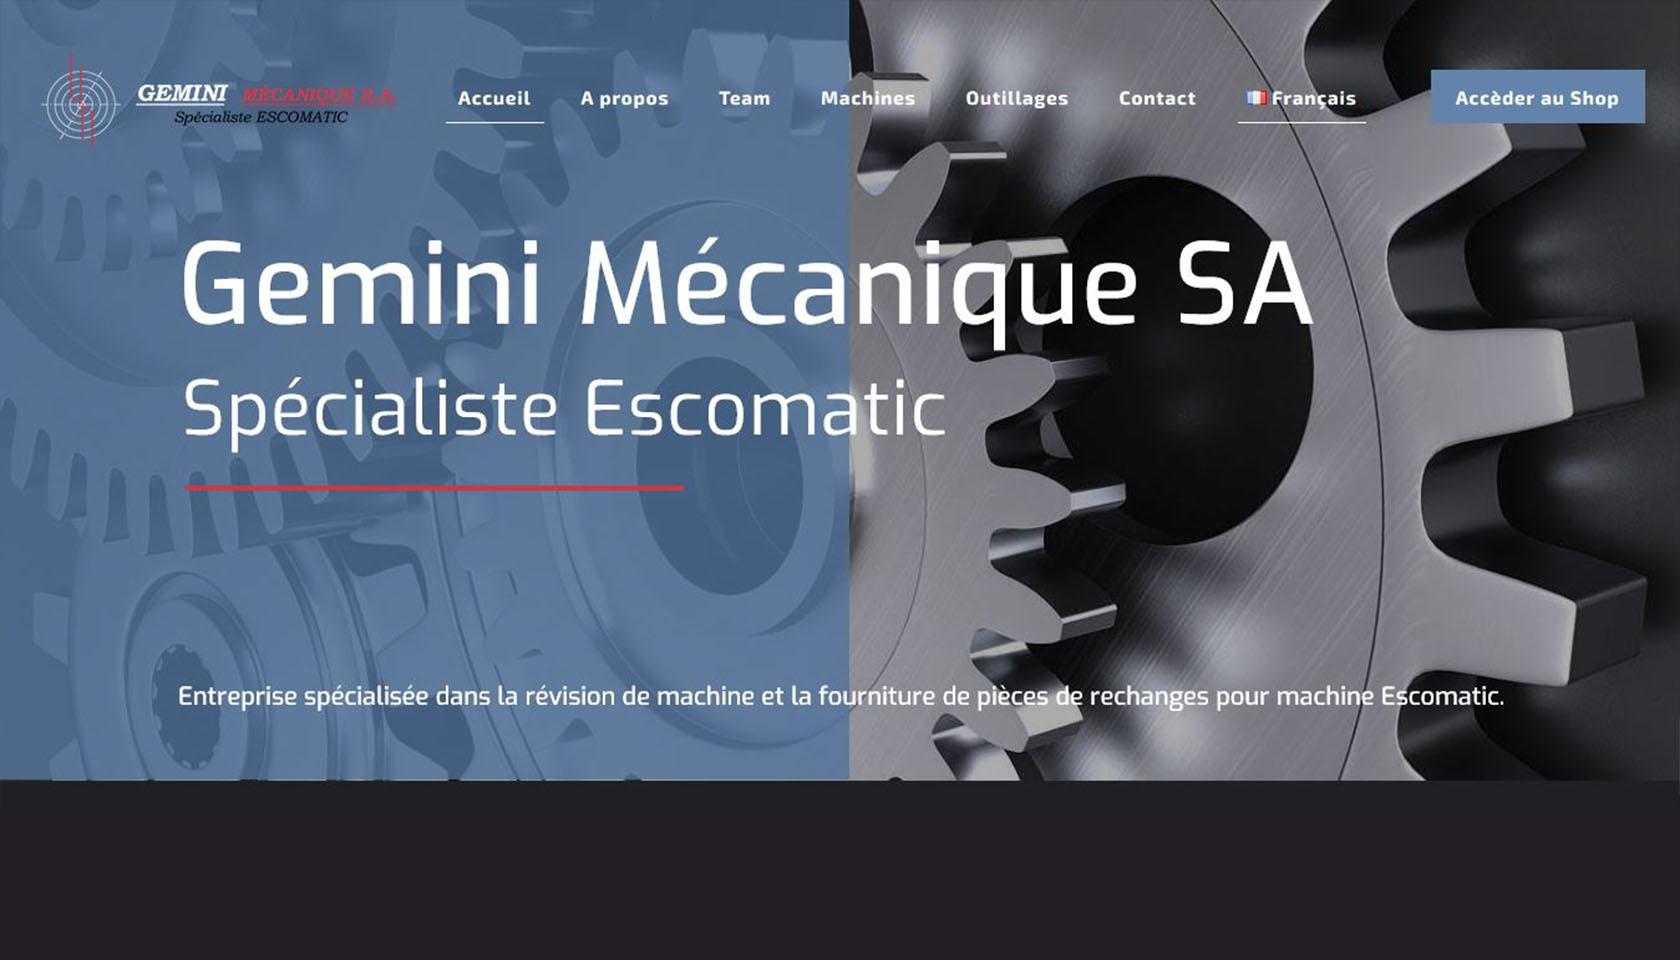 Gemini Mecanique SA